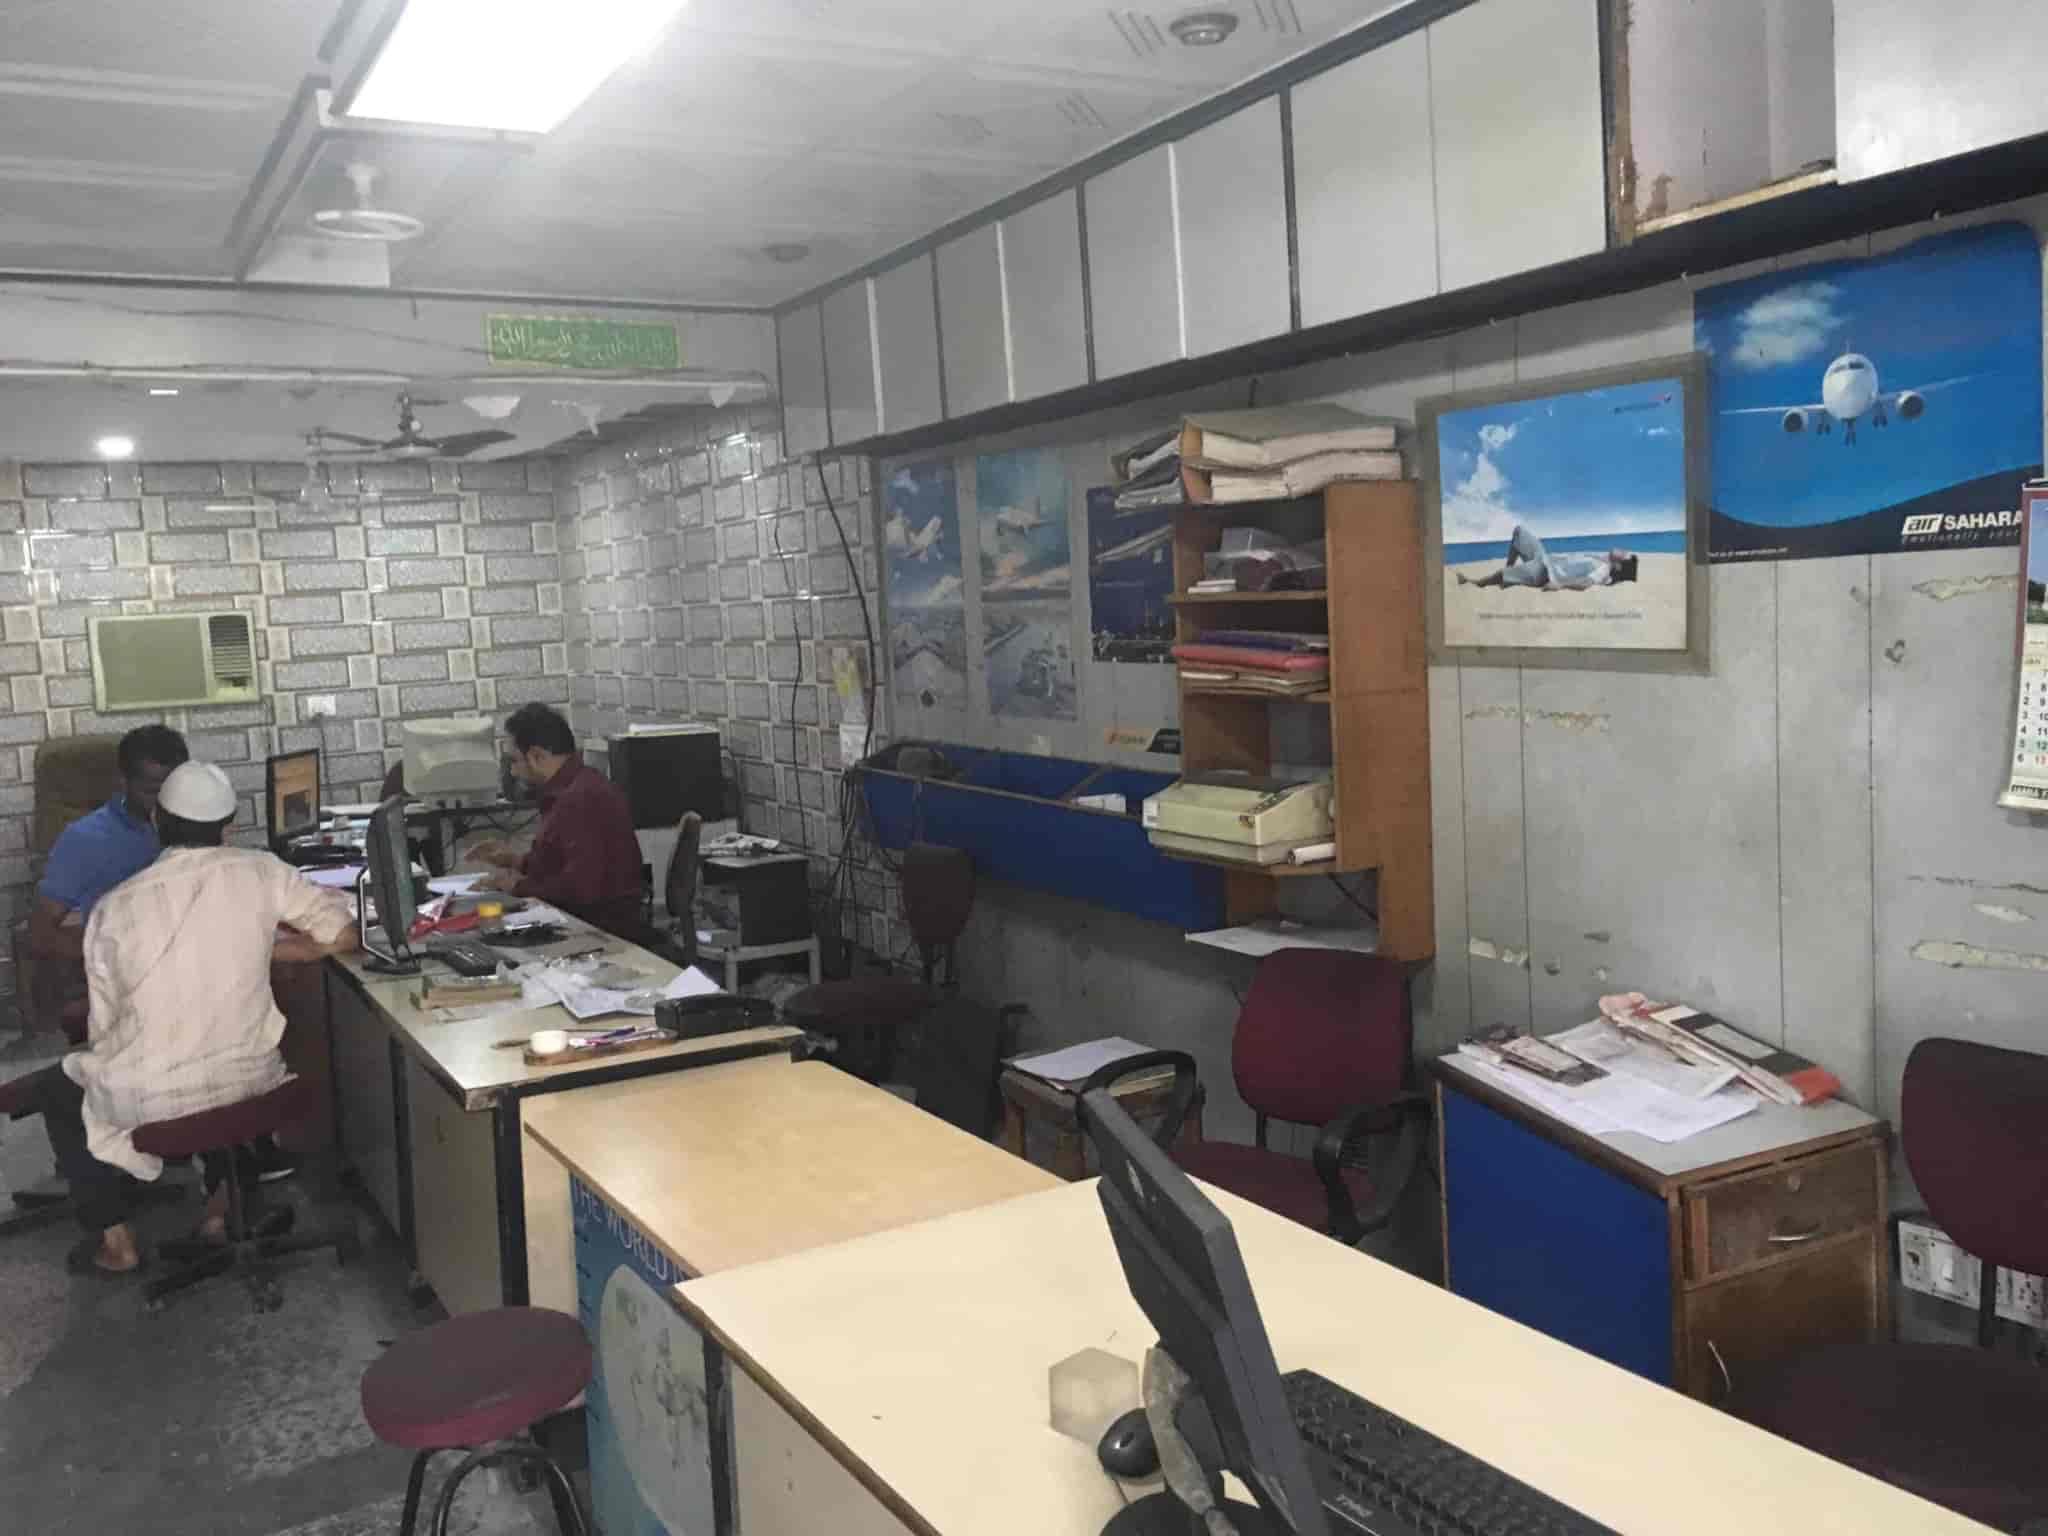 International Travel Agency, Station Road - Travel Agents in Surat